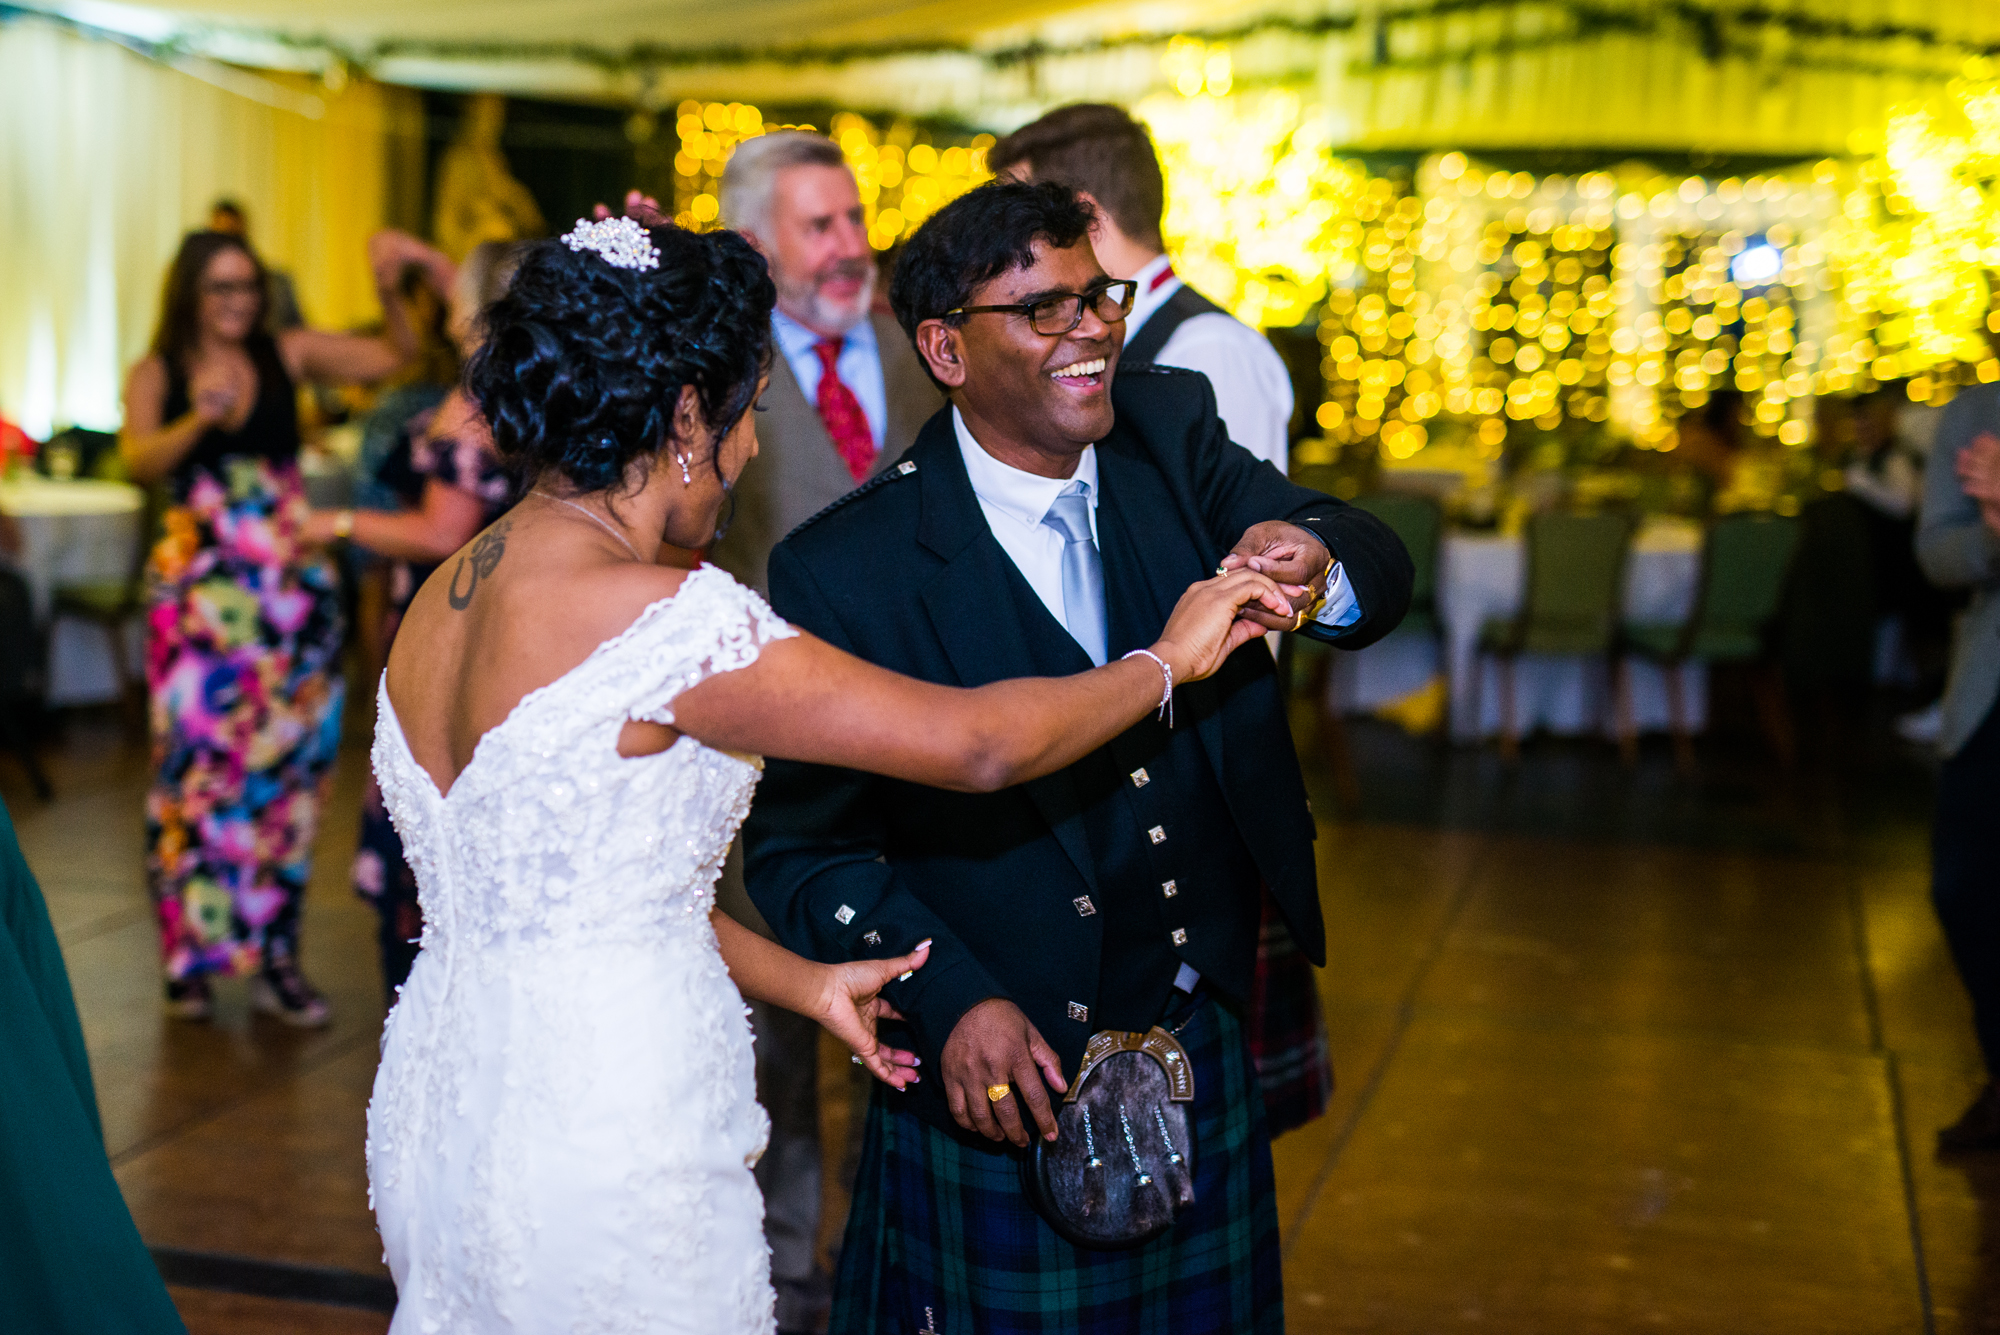 Kev and Shrabani wedding photos (329 of 350).jpg